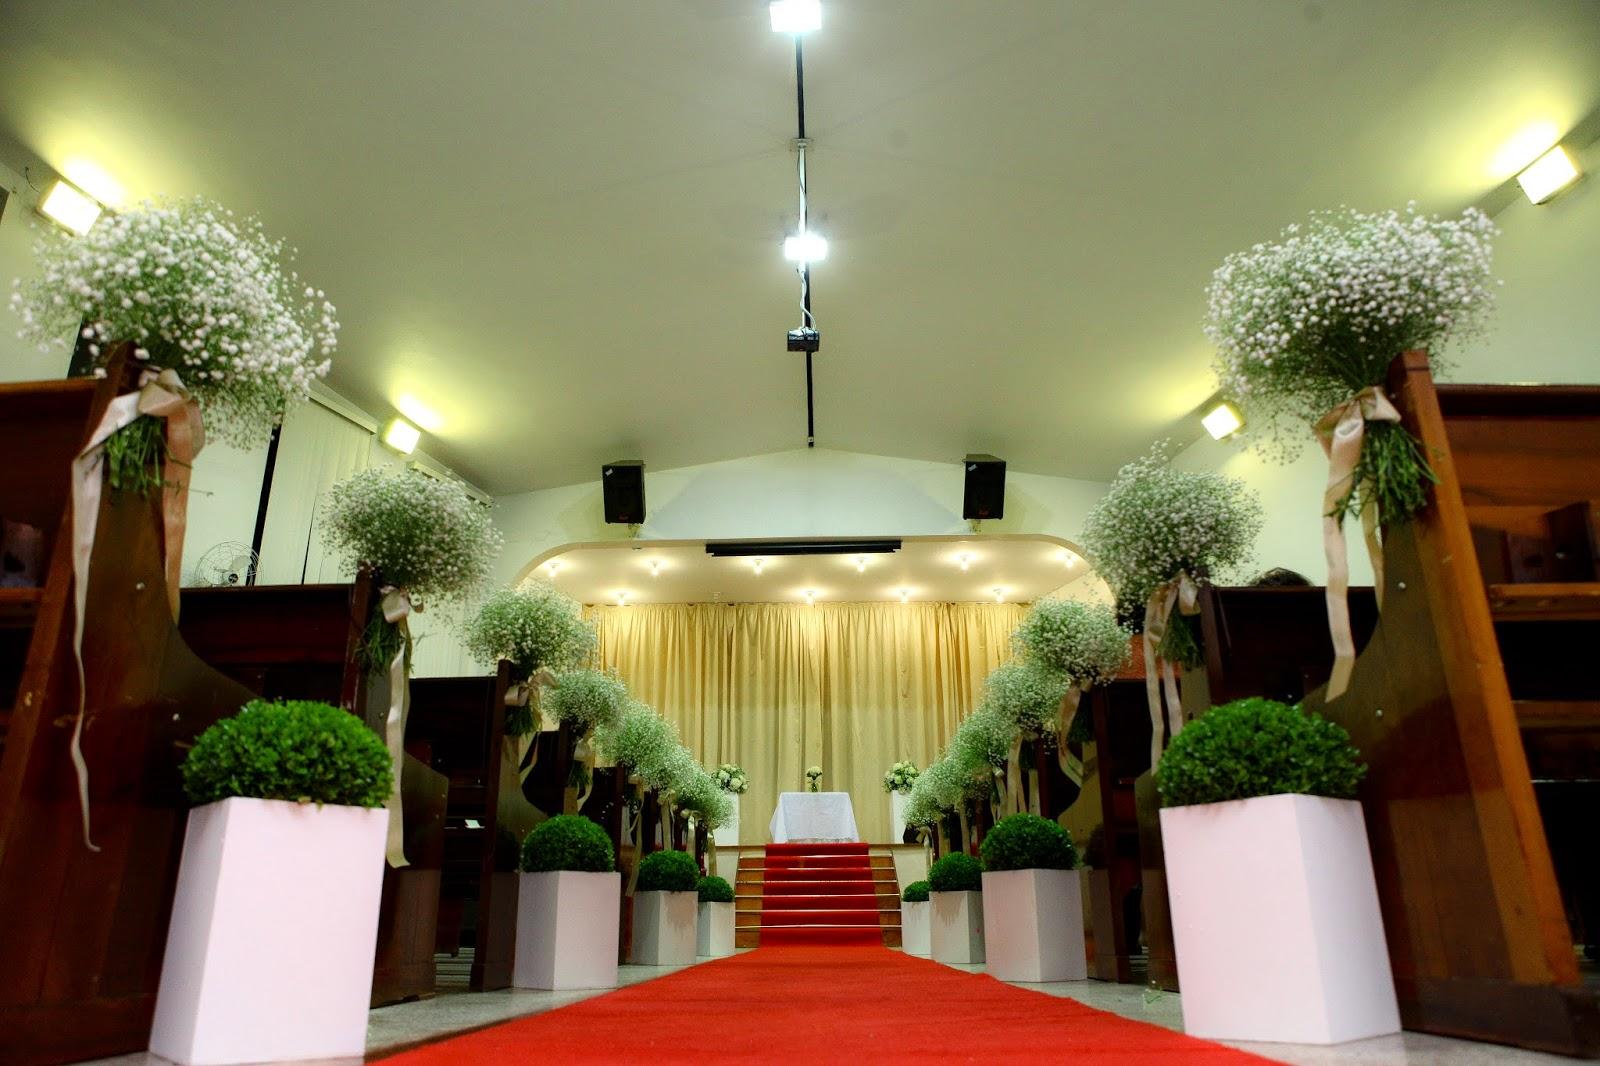 Abba Flowers: Casamento Real e economico cheio de DIY #BC270F 1600x1066